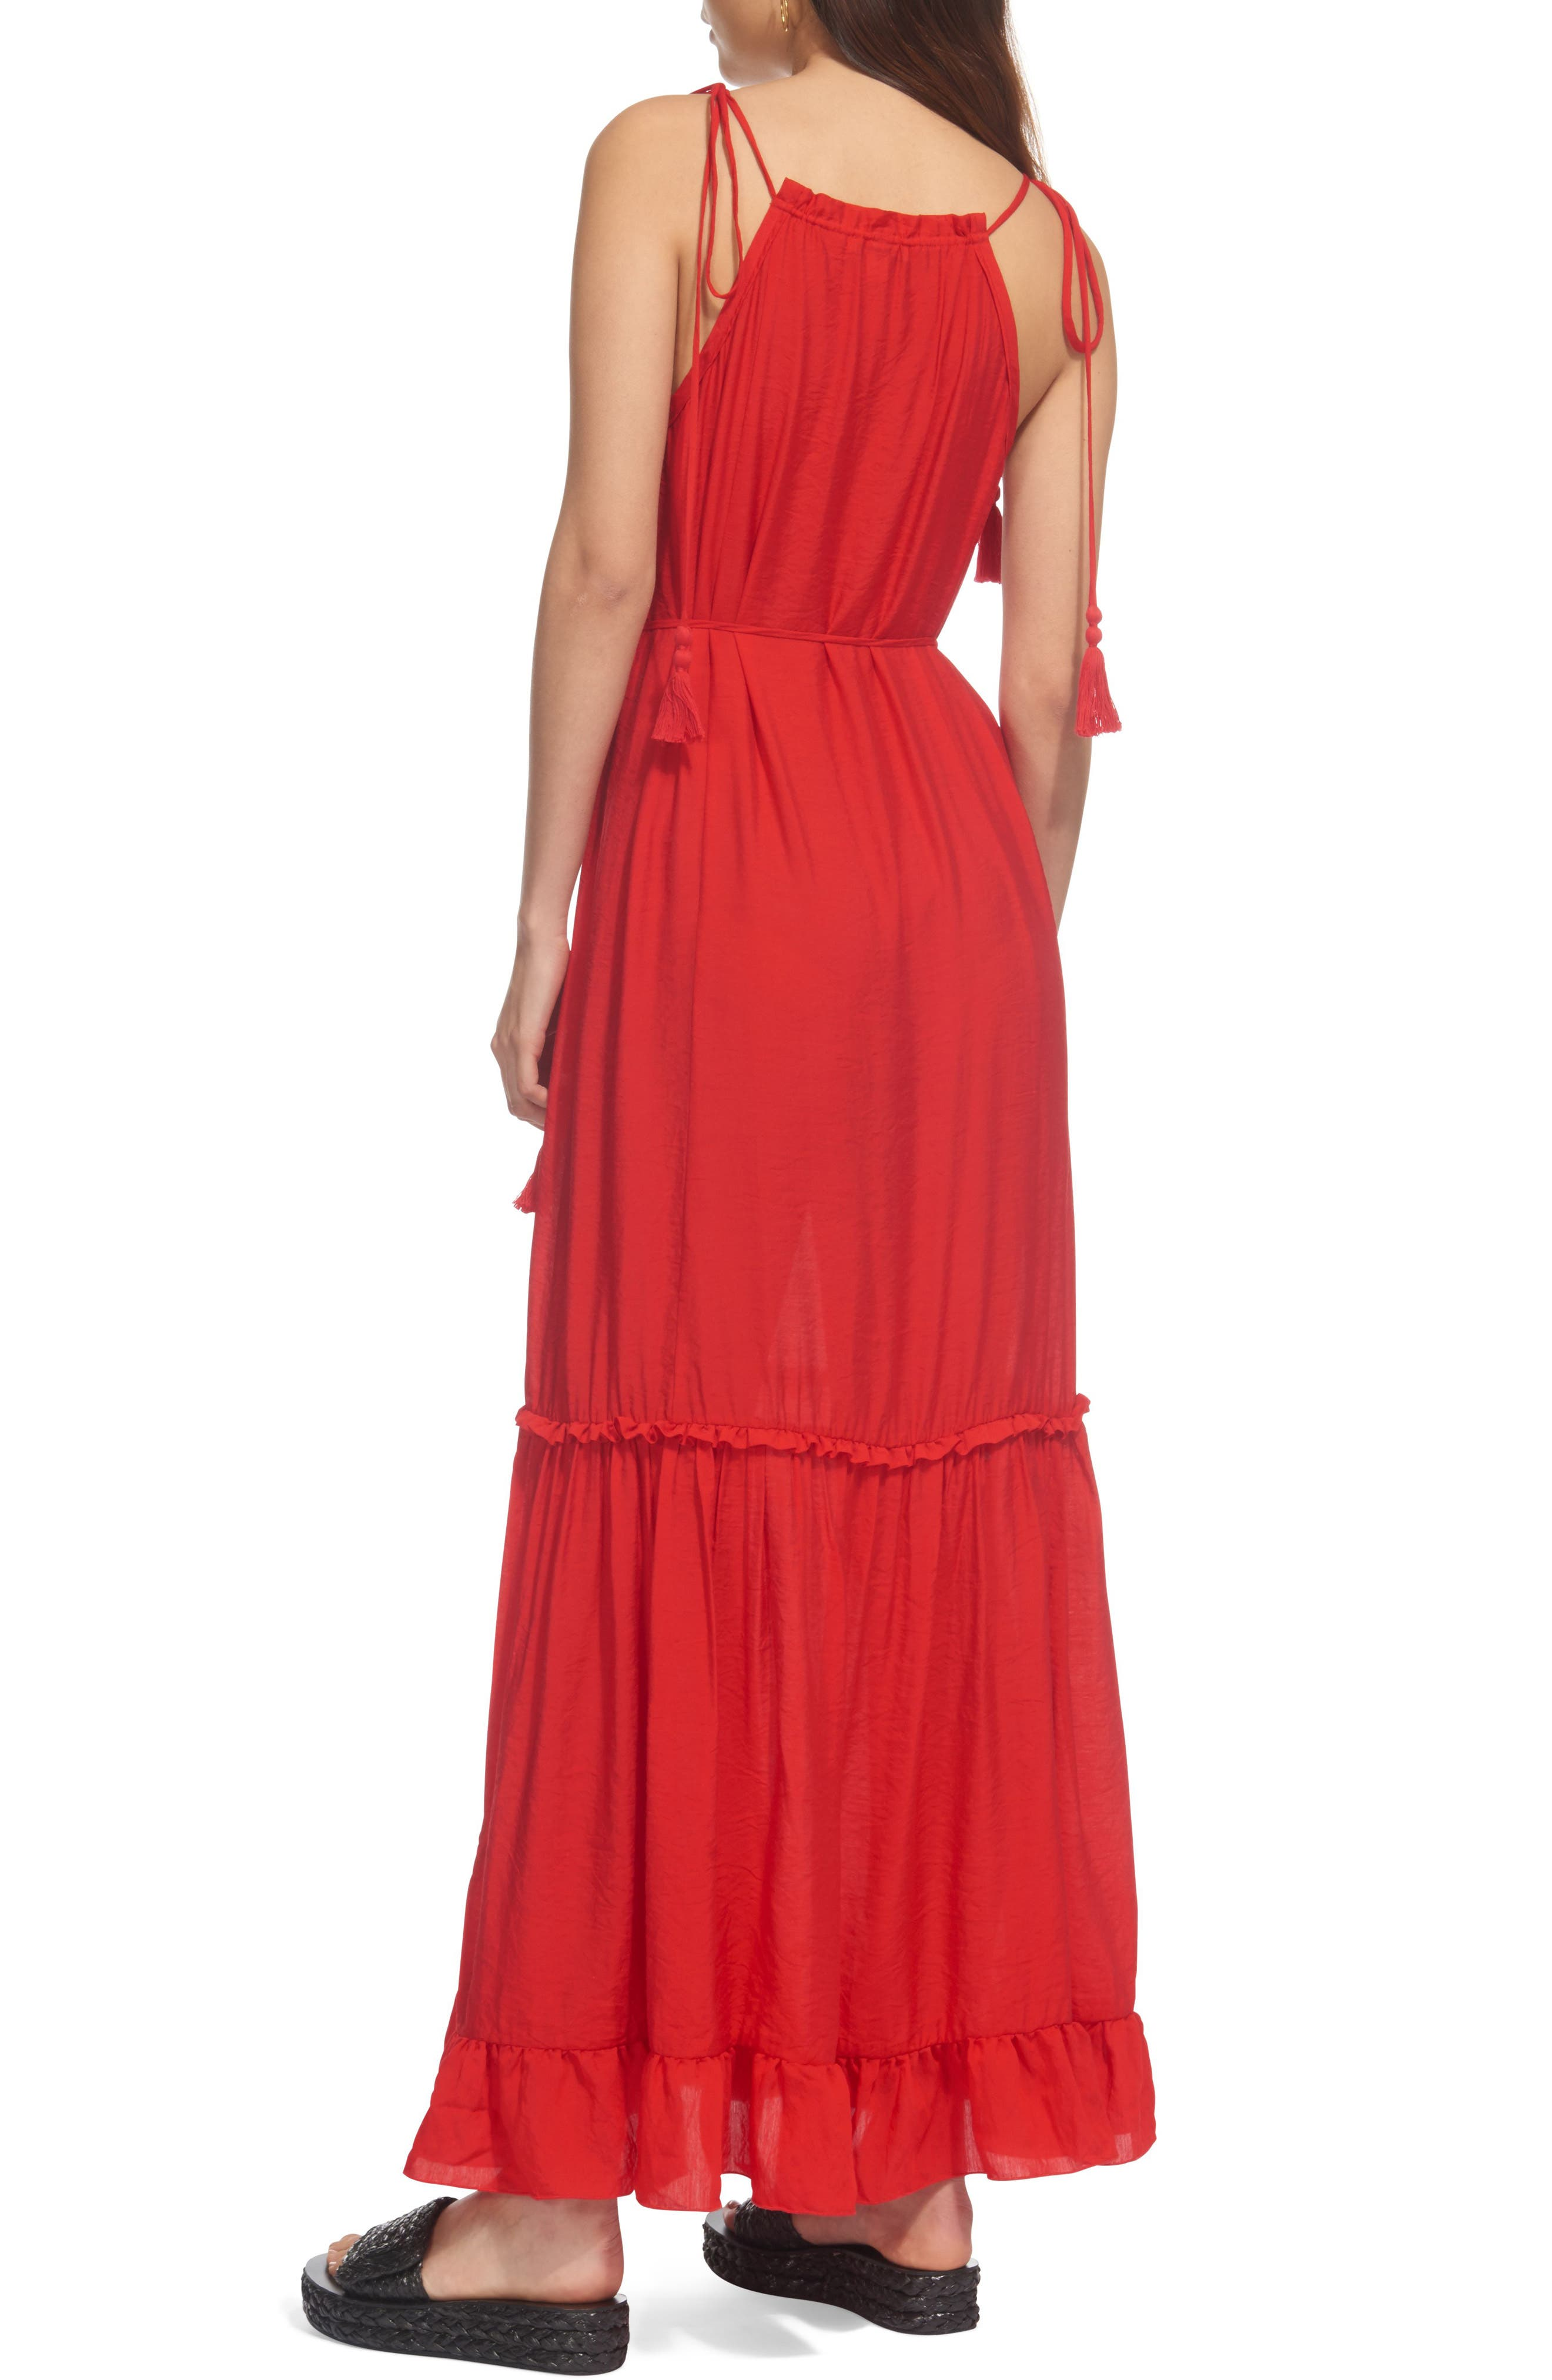 Tassel Tie Maxi Dress,                             Alternate thumbnail 2, color,                             Red